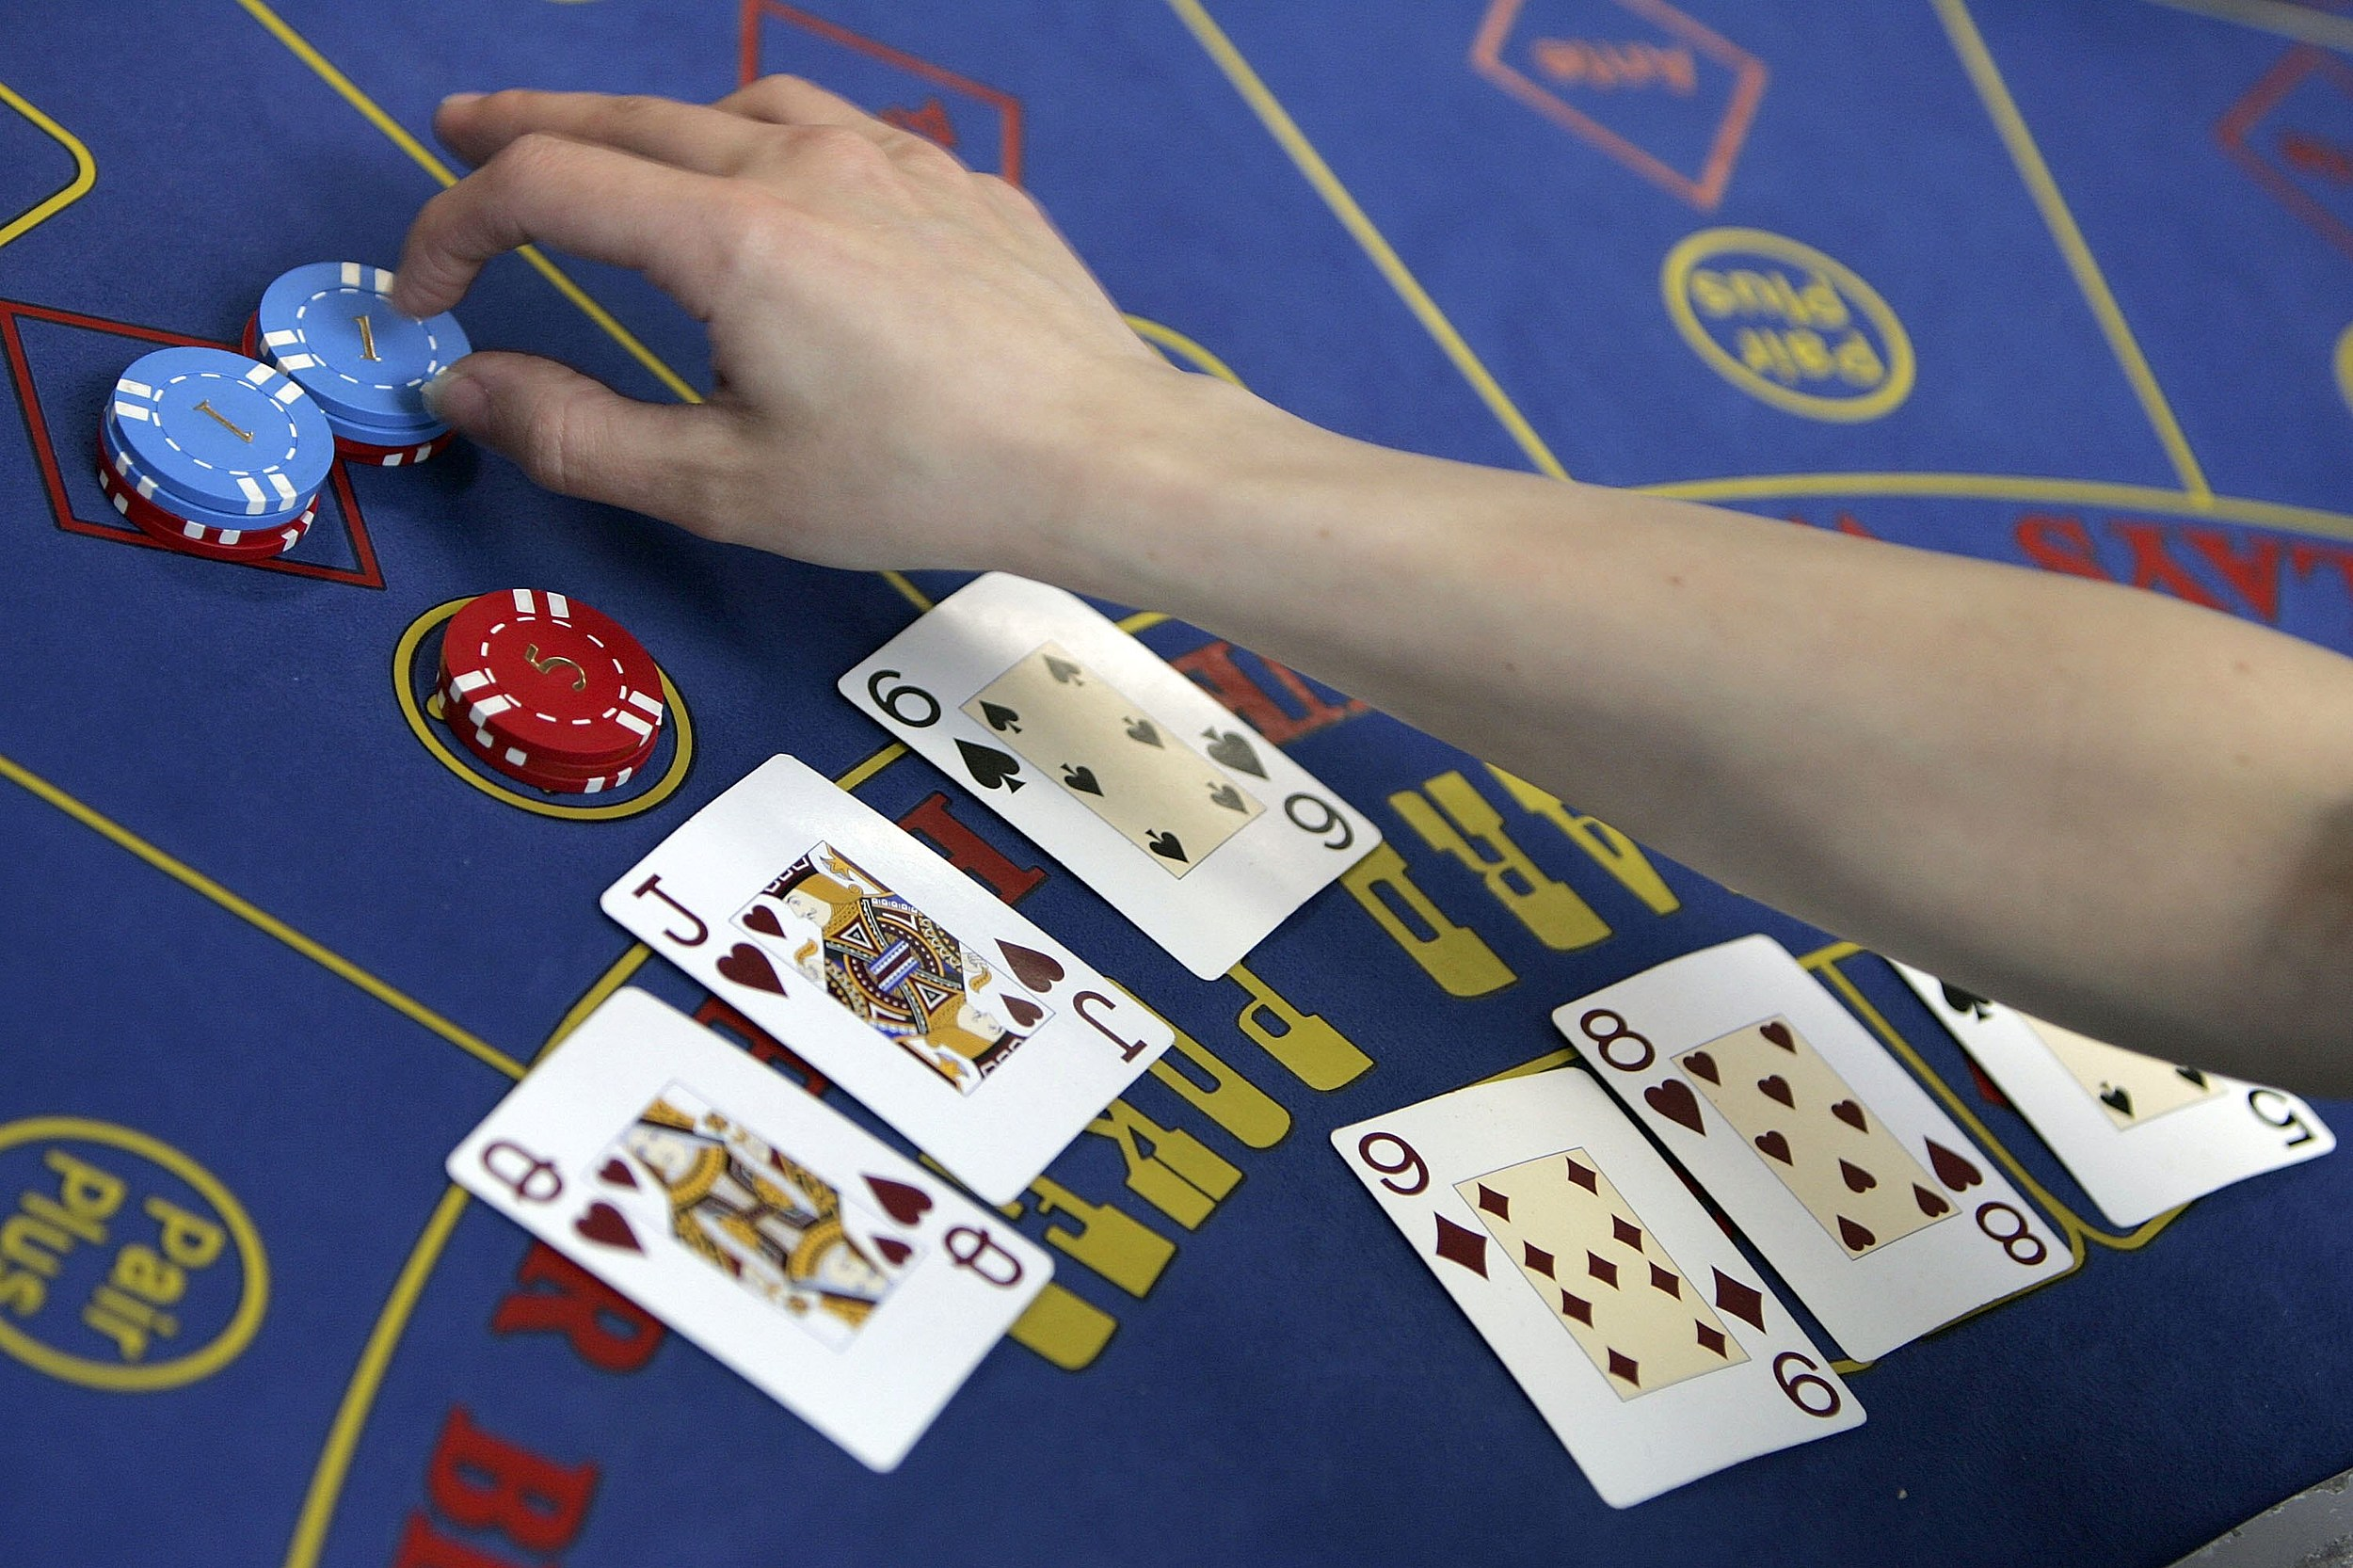 Casino school new jersey gambling vacations